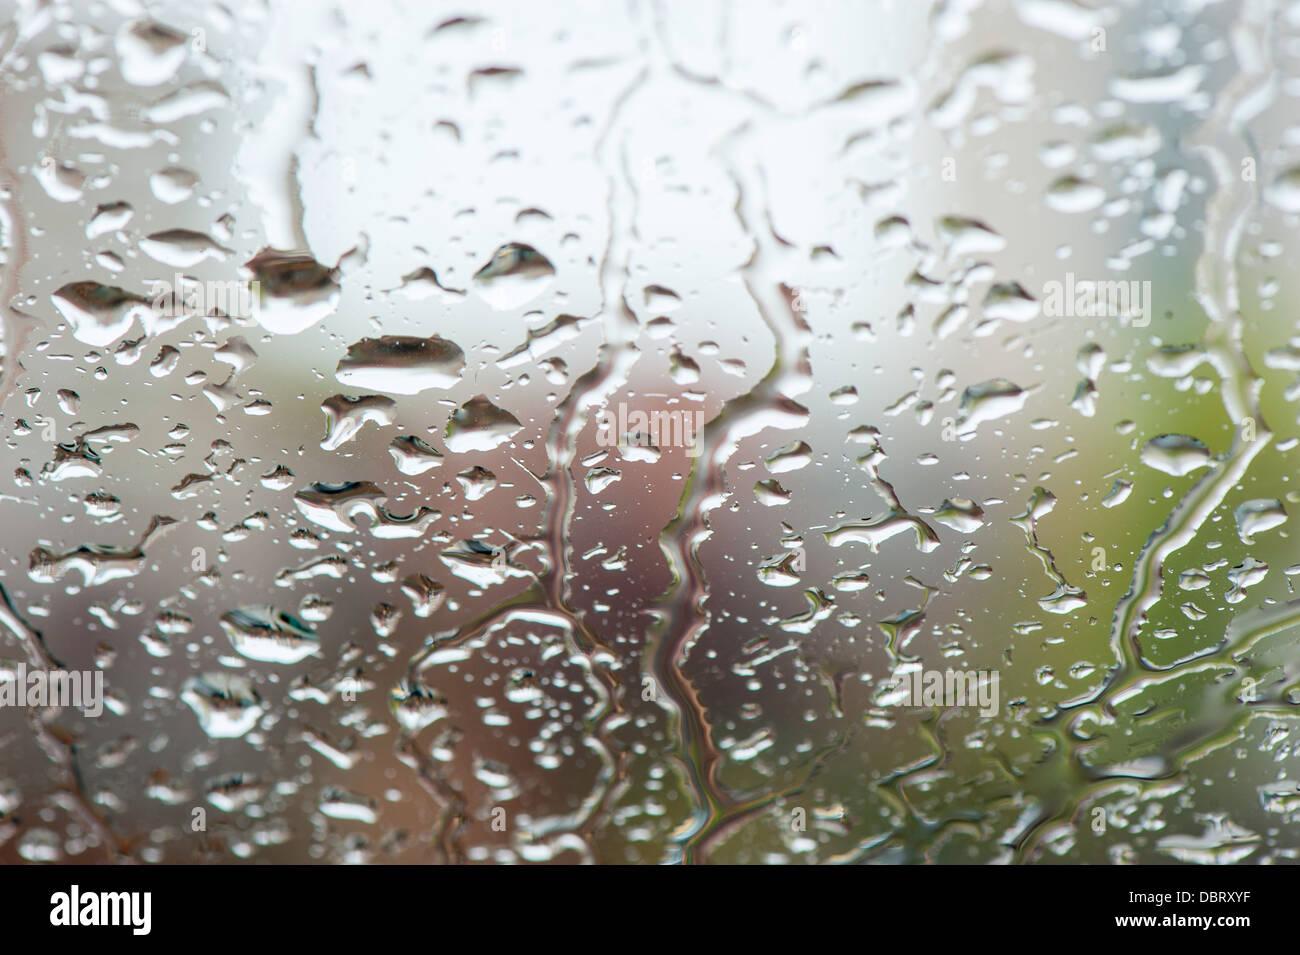 water on window rain drops - Stock Image